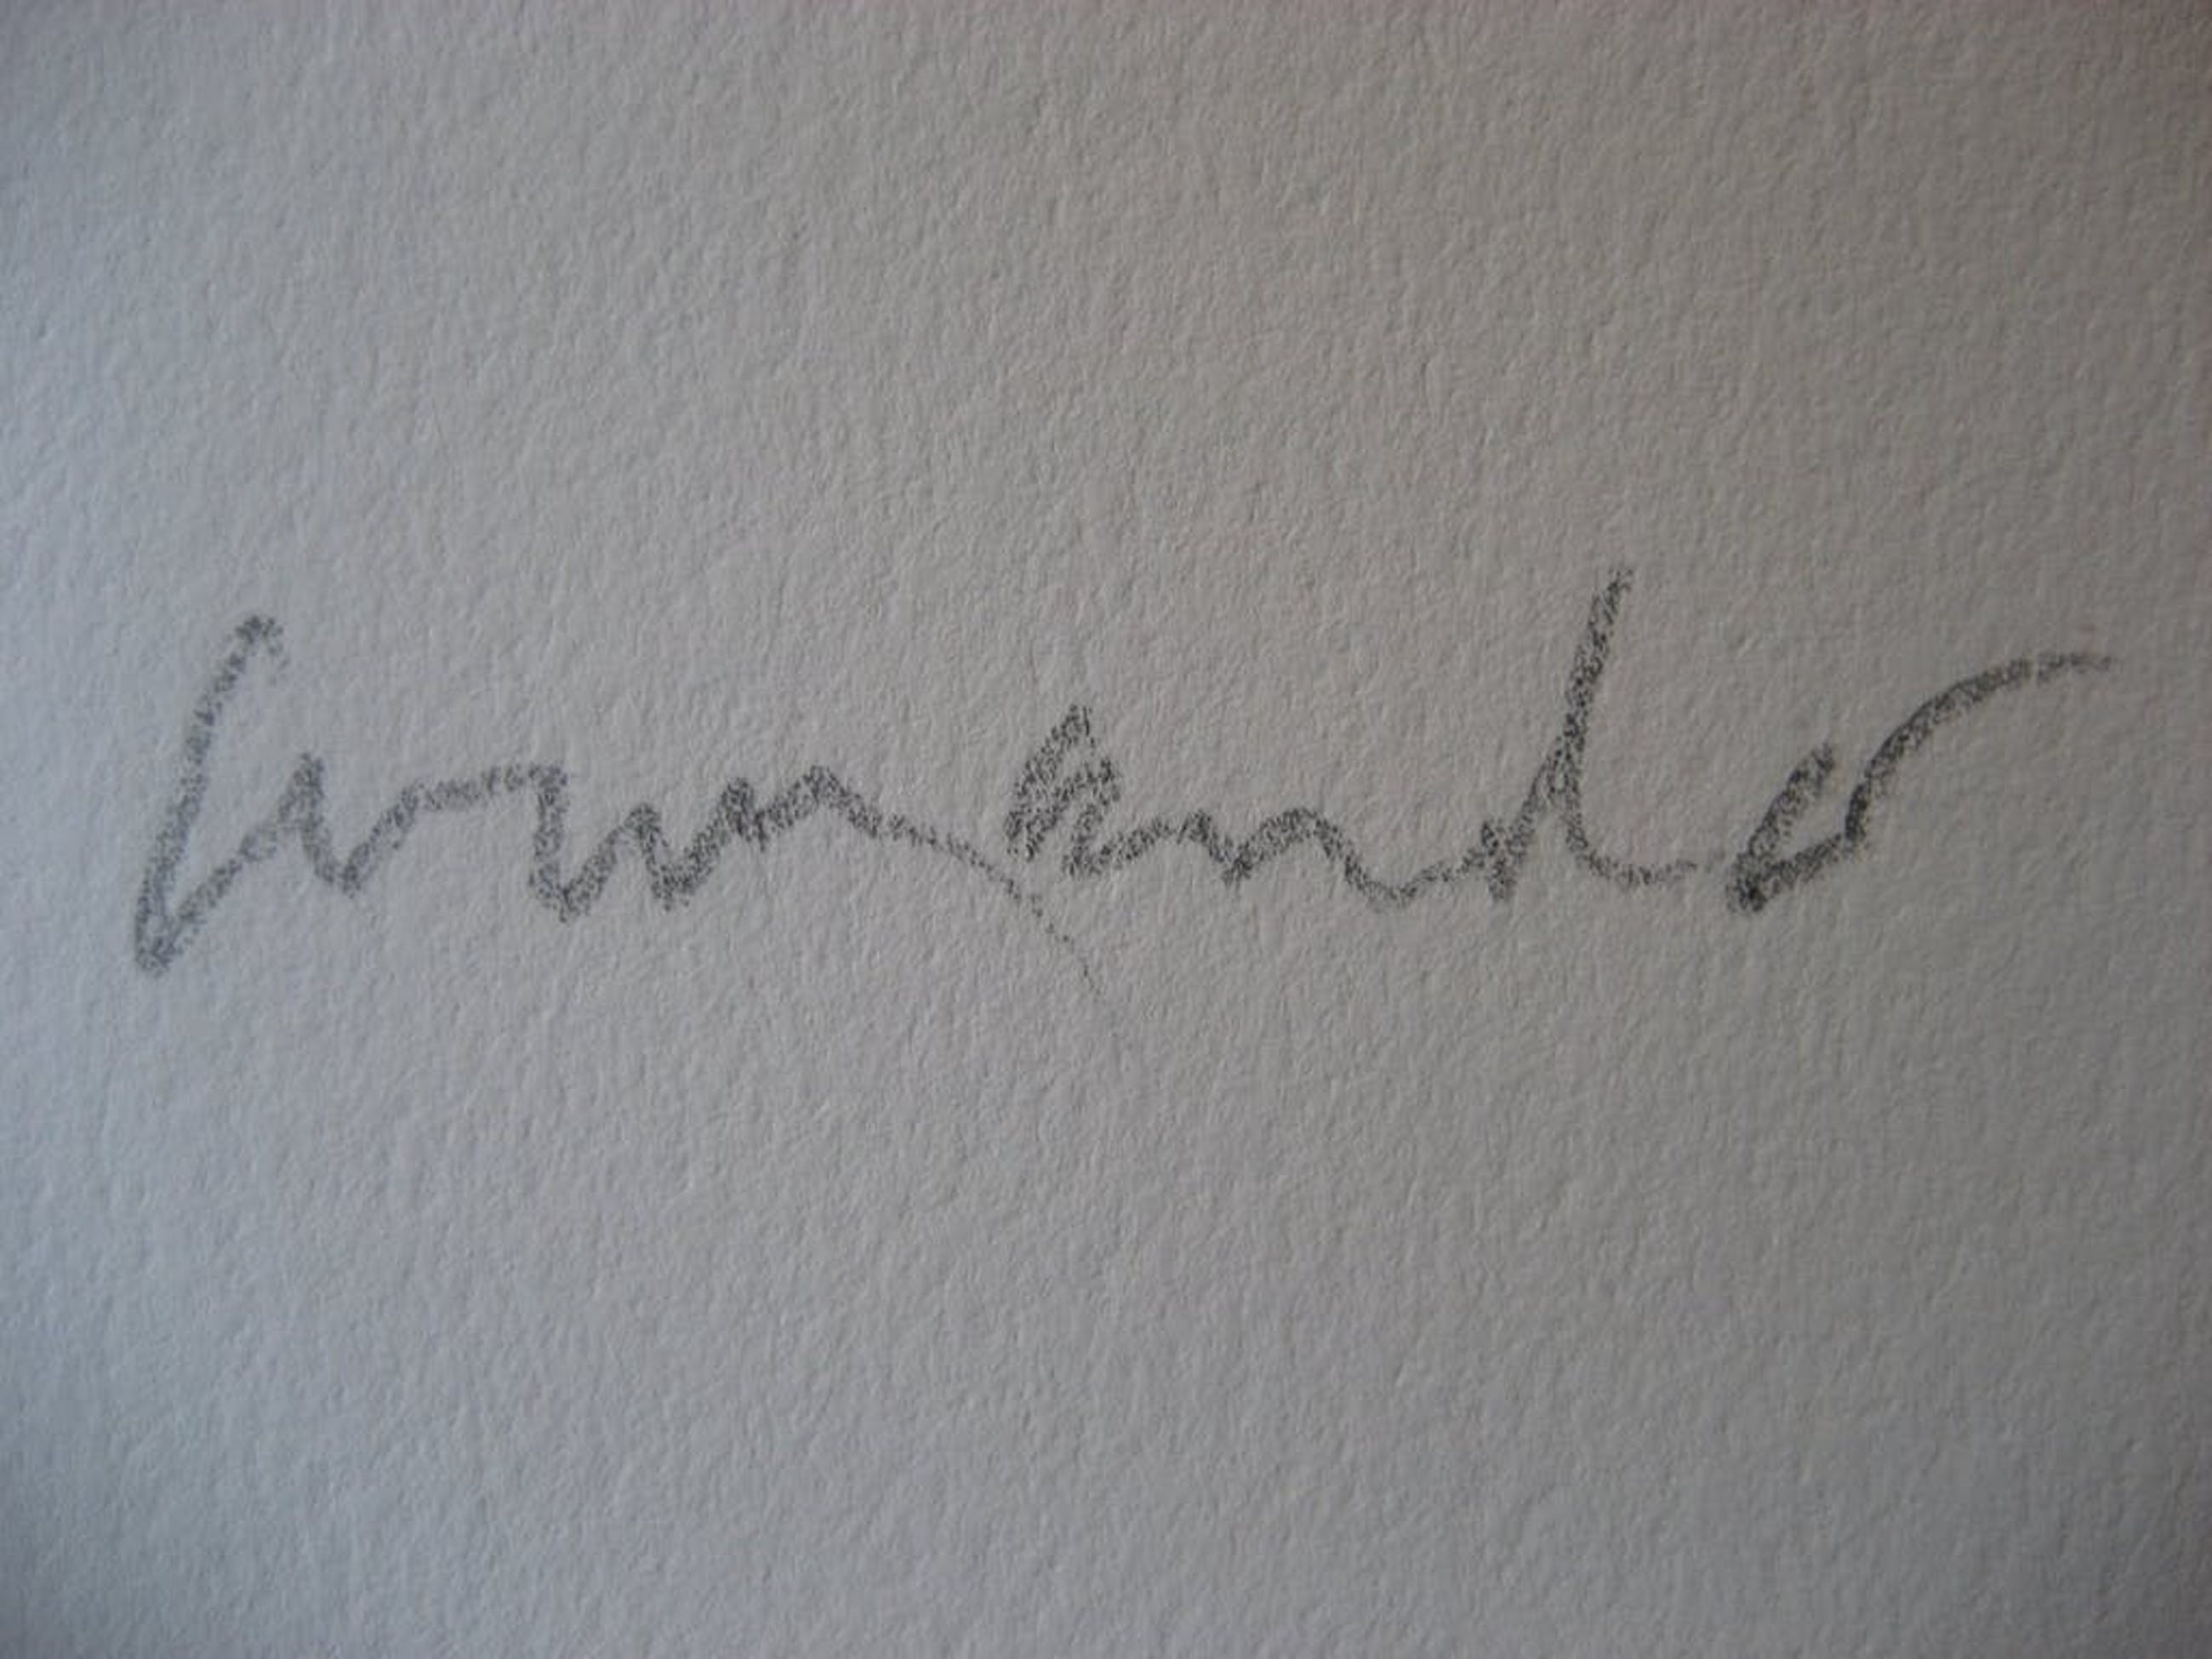 Armando - Armando - Glicée - 'Wasser'- 2015 - nr. 30/30 kopen? Bied vanaf 175!